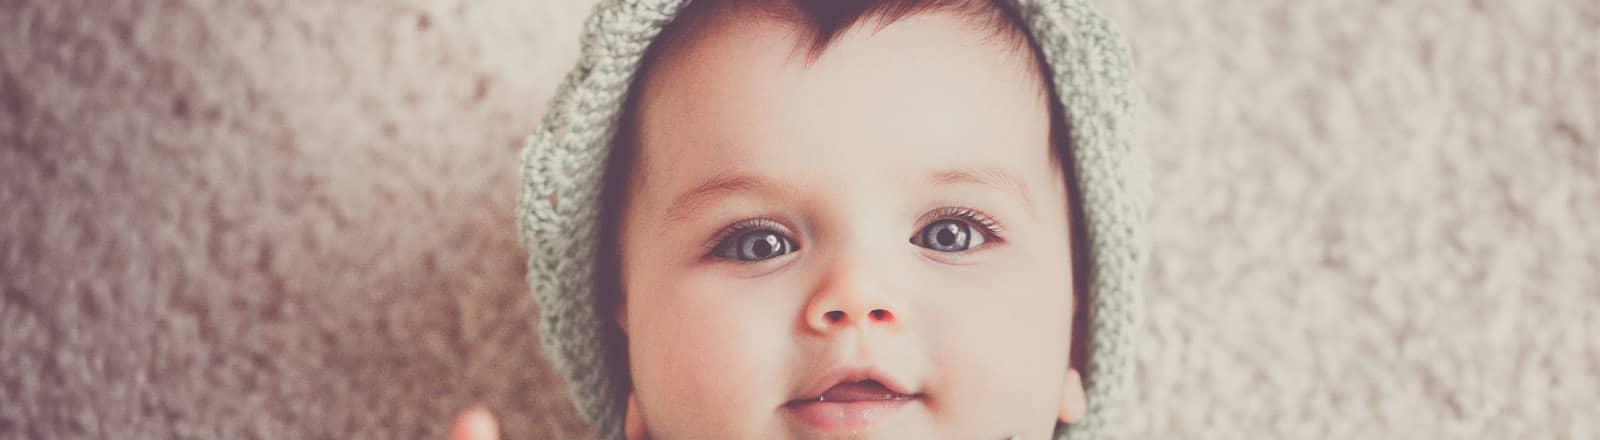 colicos del lactante fisioterapia del bebe